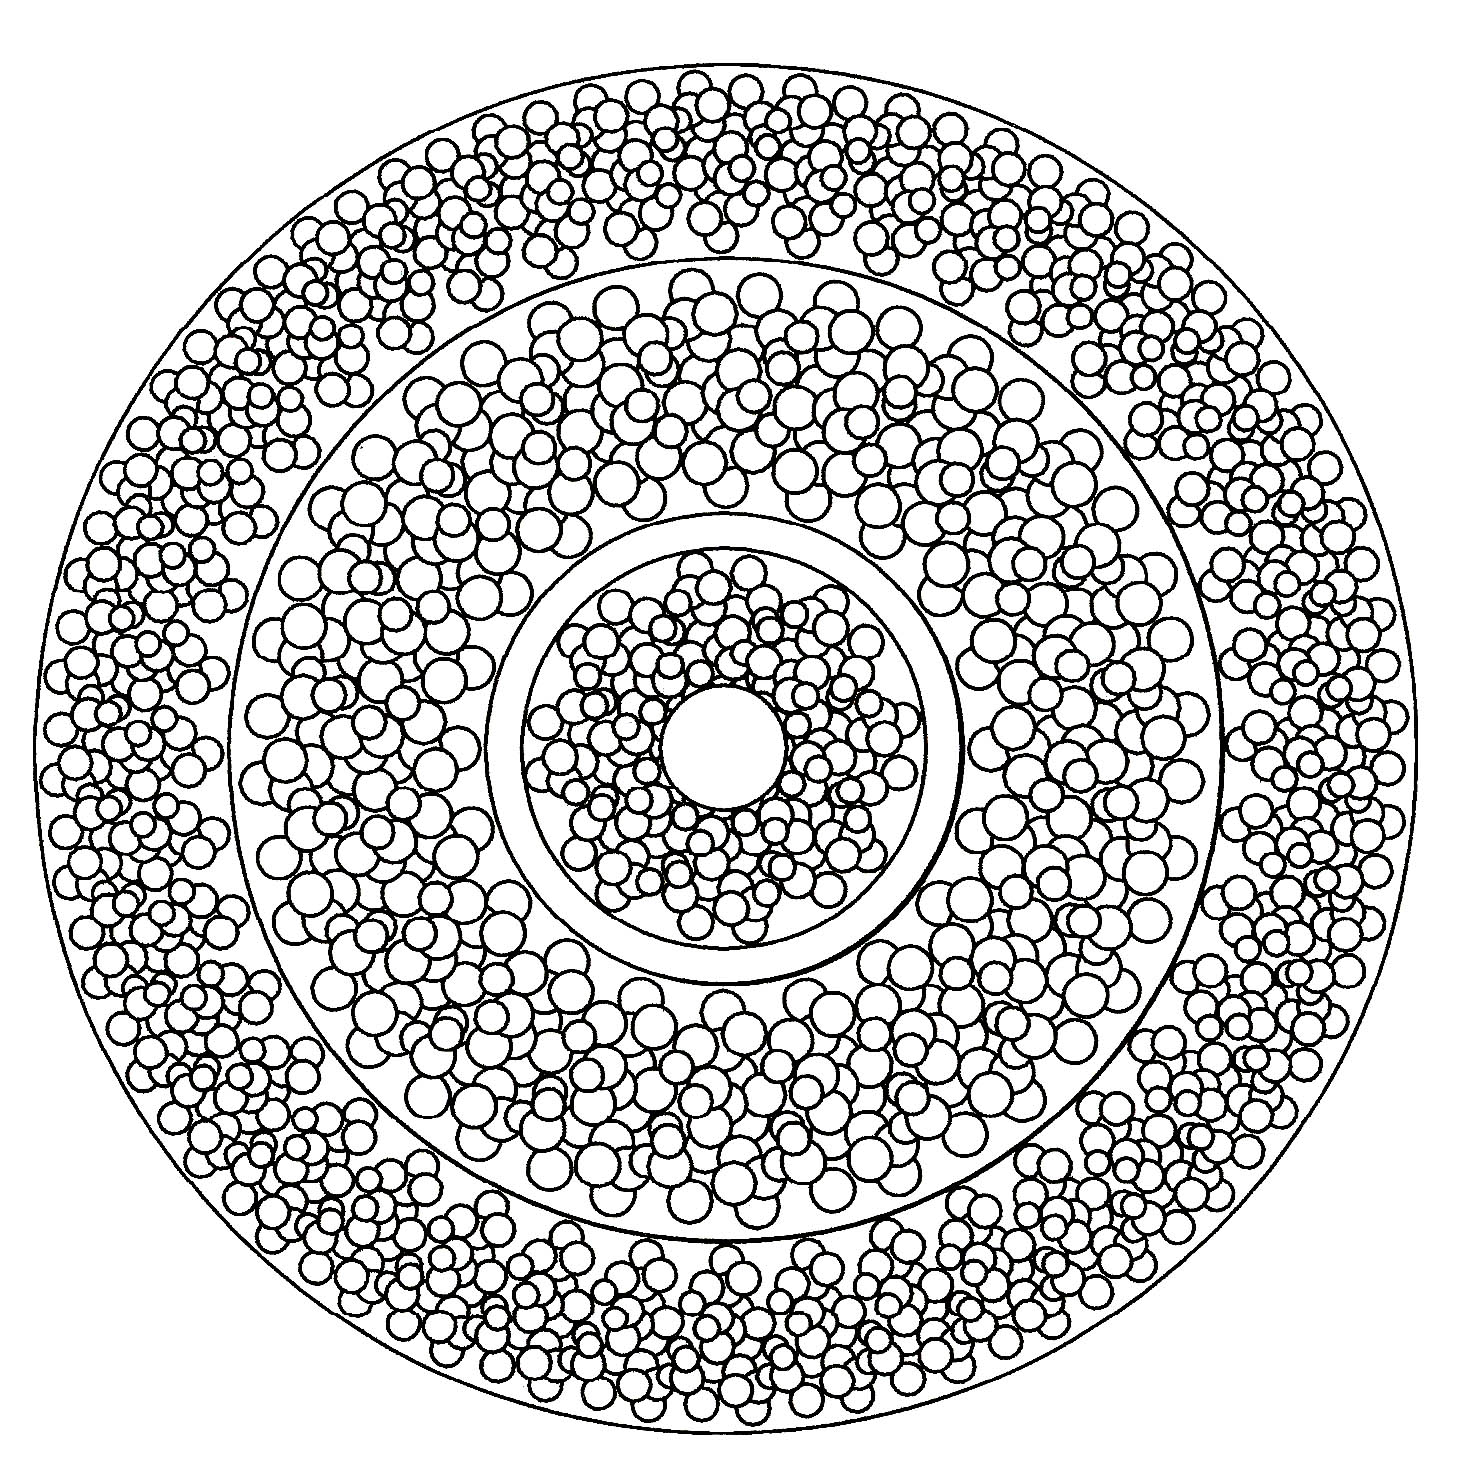 Mandala With Lots Of Little Circles Mandalas With